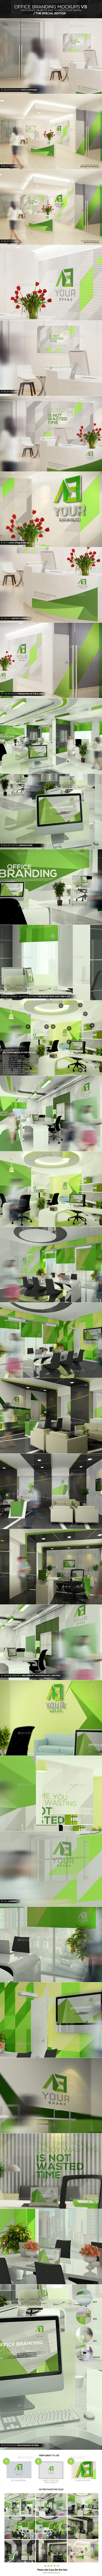 GraphicRiver Office Branding Mockups V5 11515811